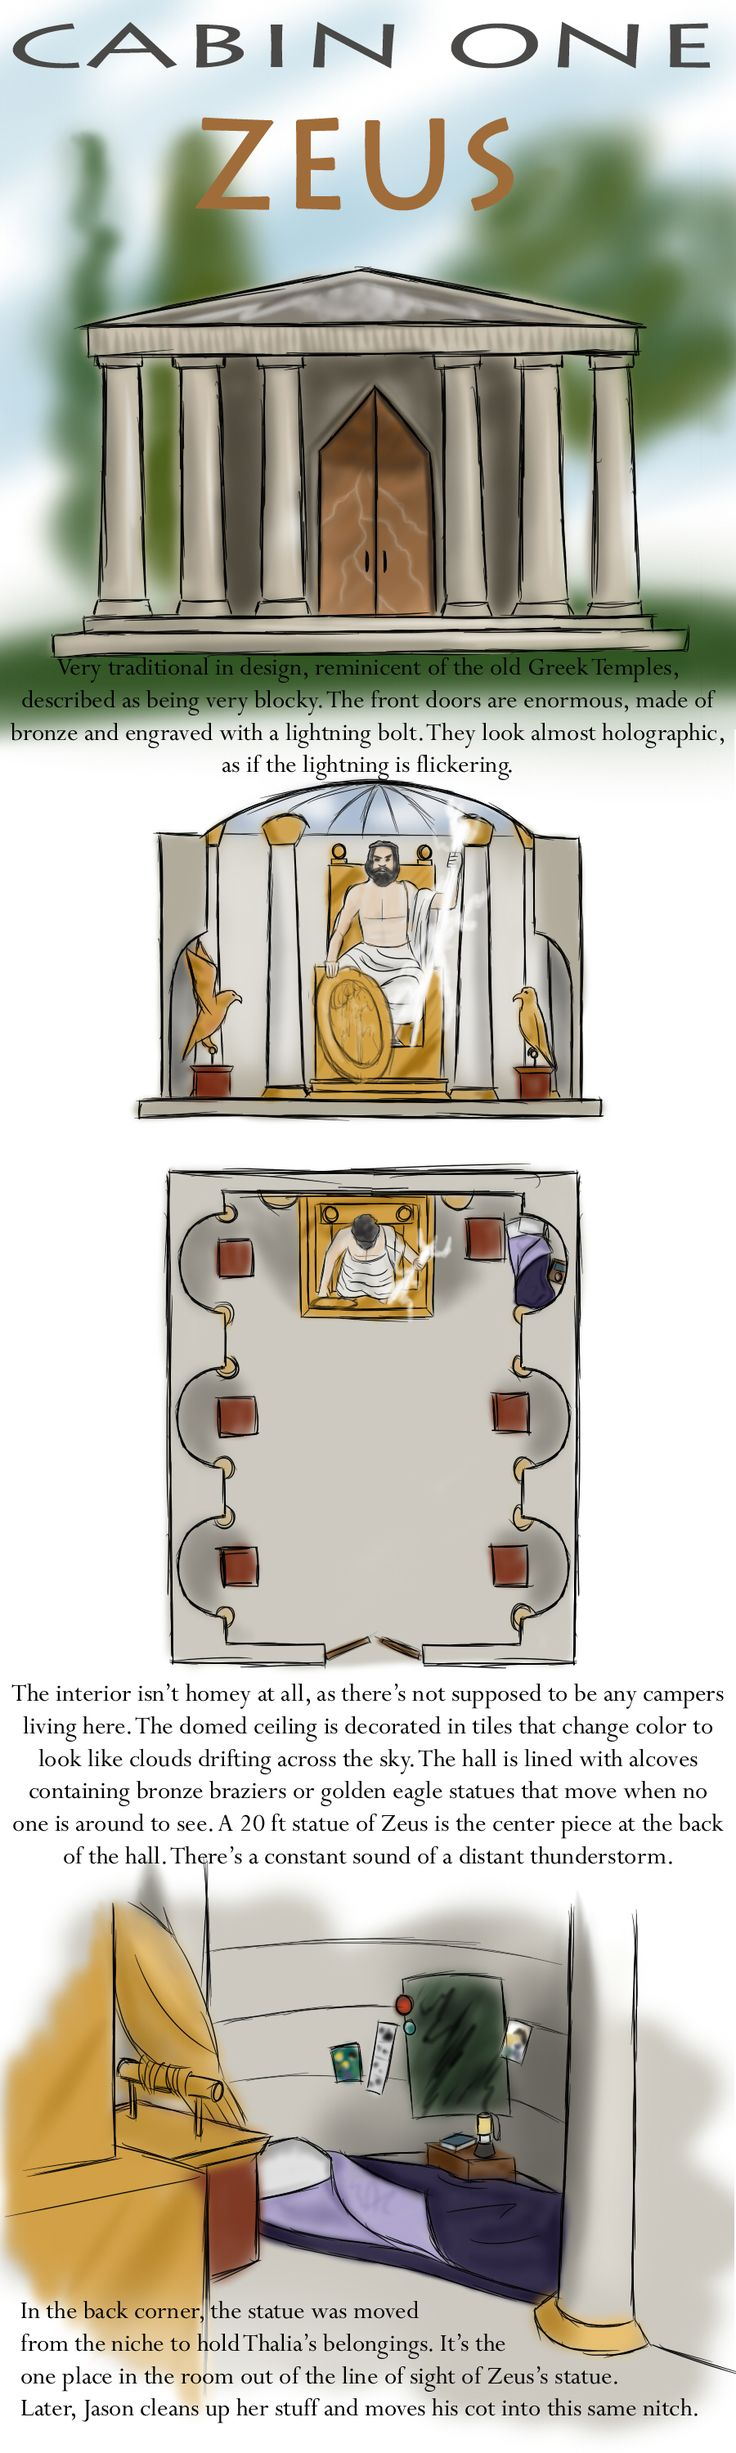 Cabaña #1, Zeus.